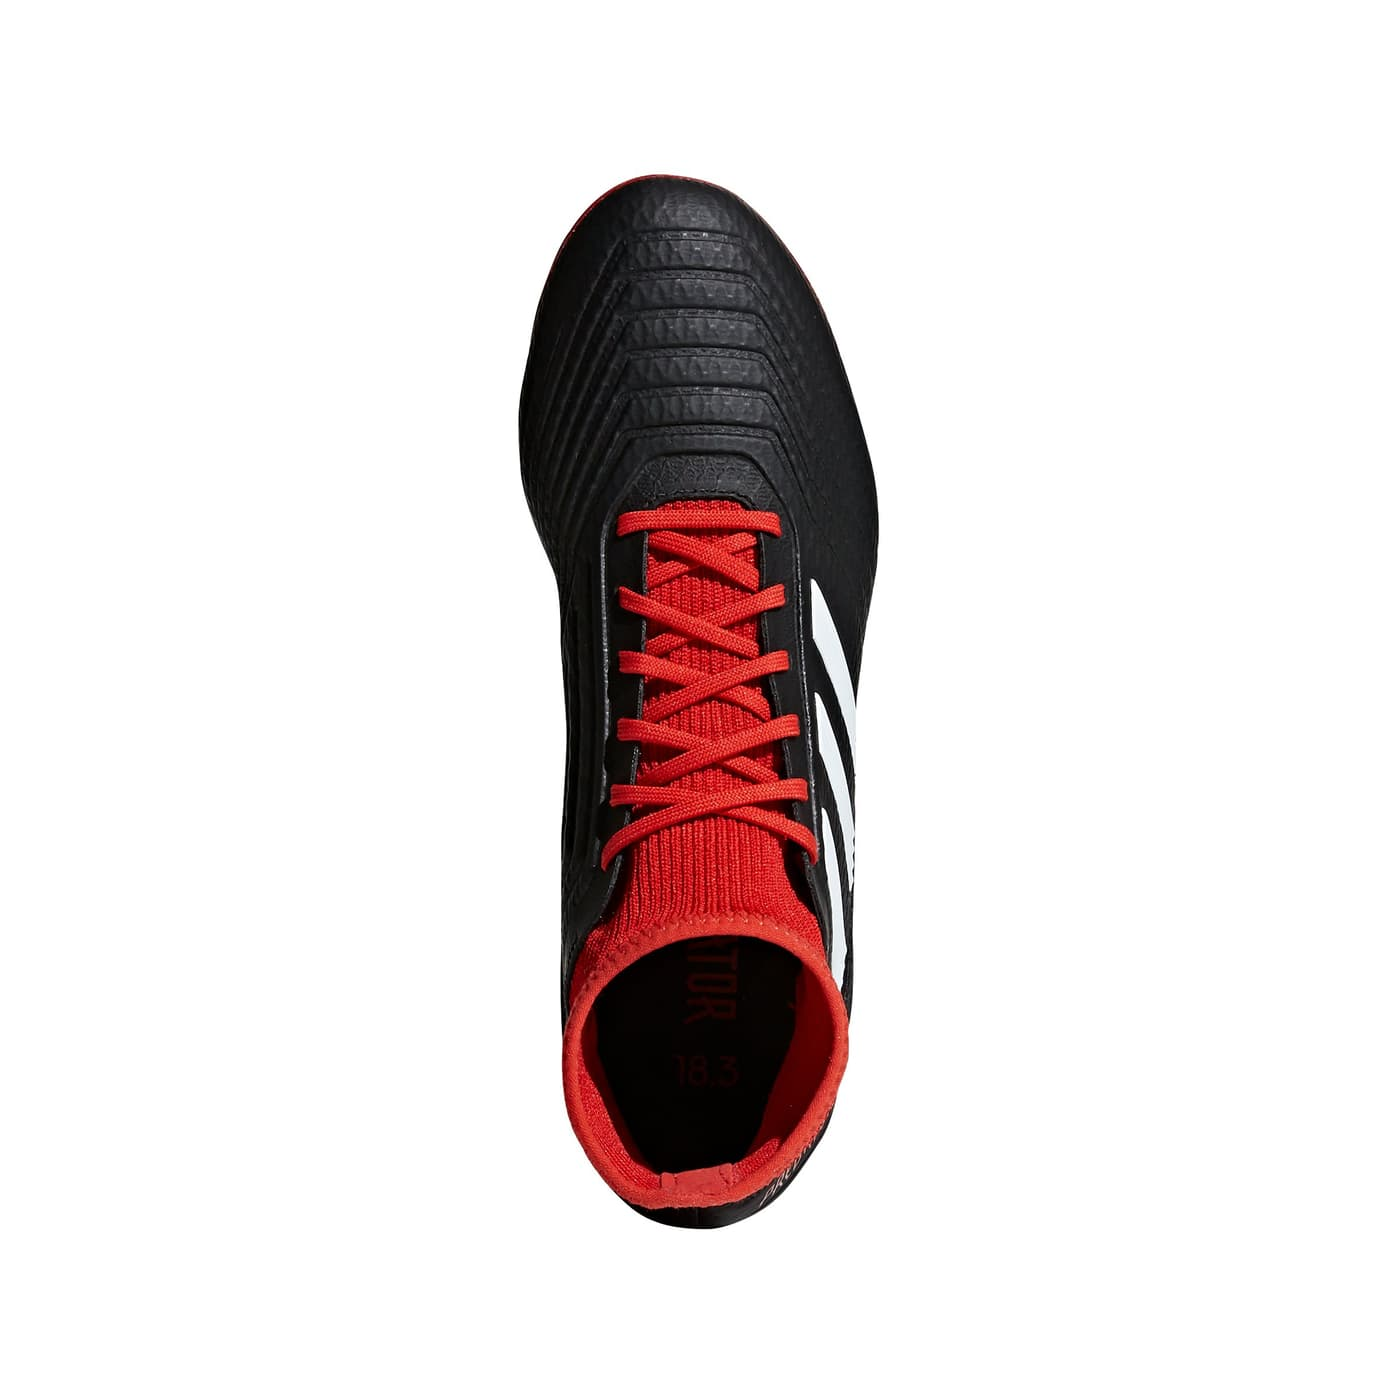 new product 50277 1d0aa ... Adidas Predator 18.3 FG Scarpa da calcio uomo ...